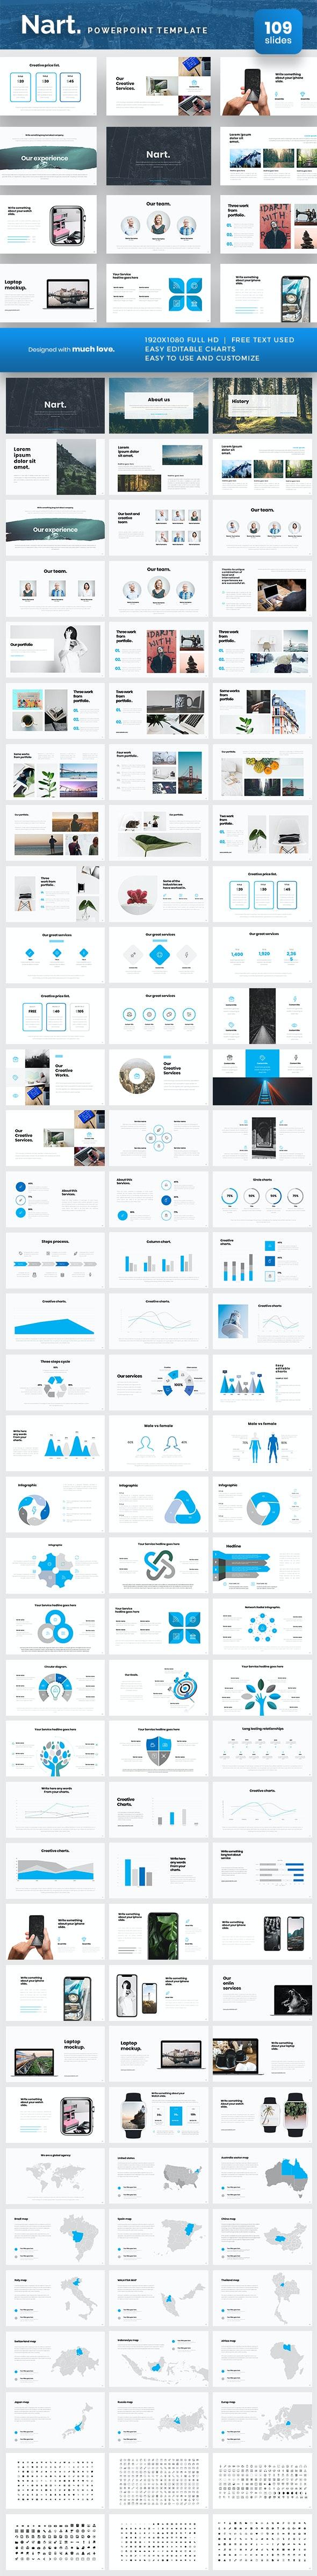 Nart Powerpoint Presentation Template - PowerPoint Templates Presentation Templates